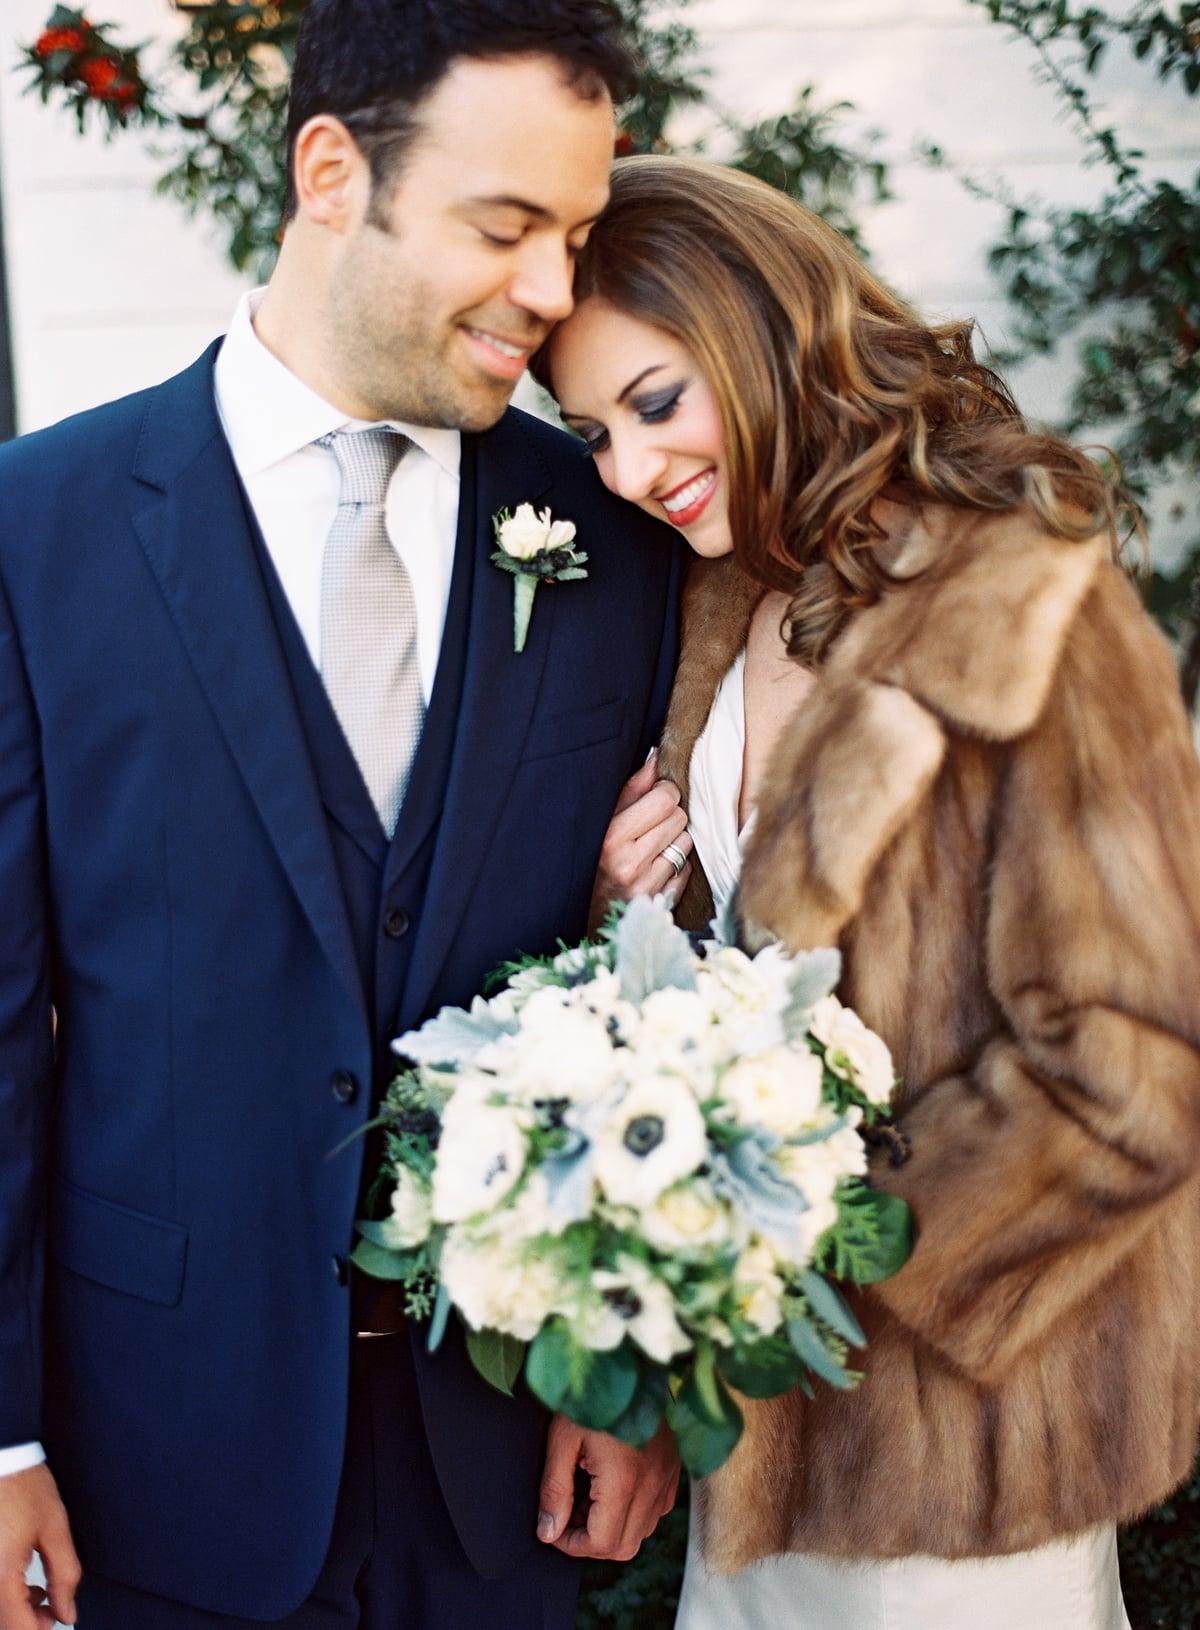 clifton-inn-wedding-034.jpg